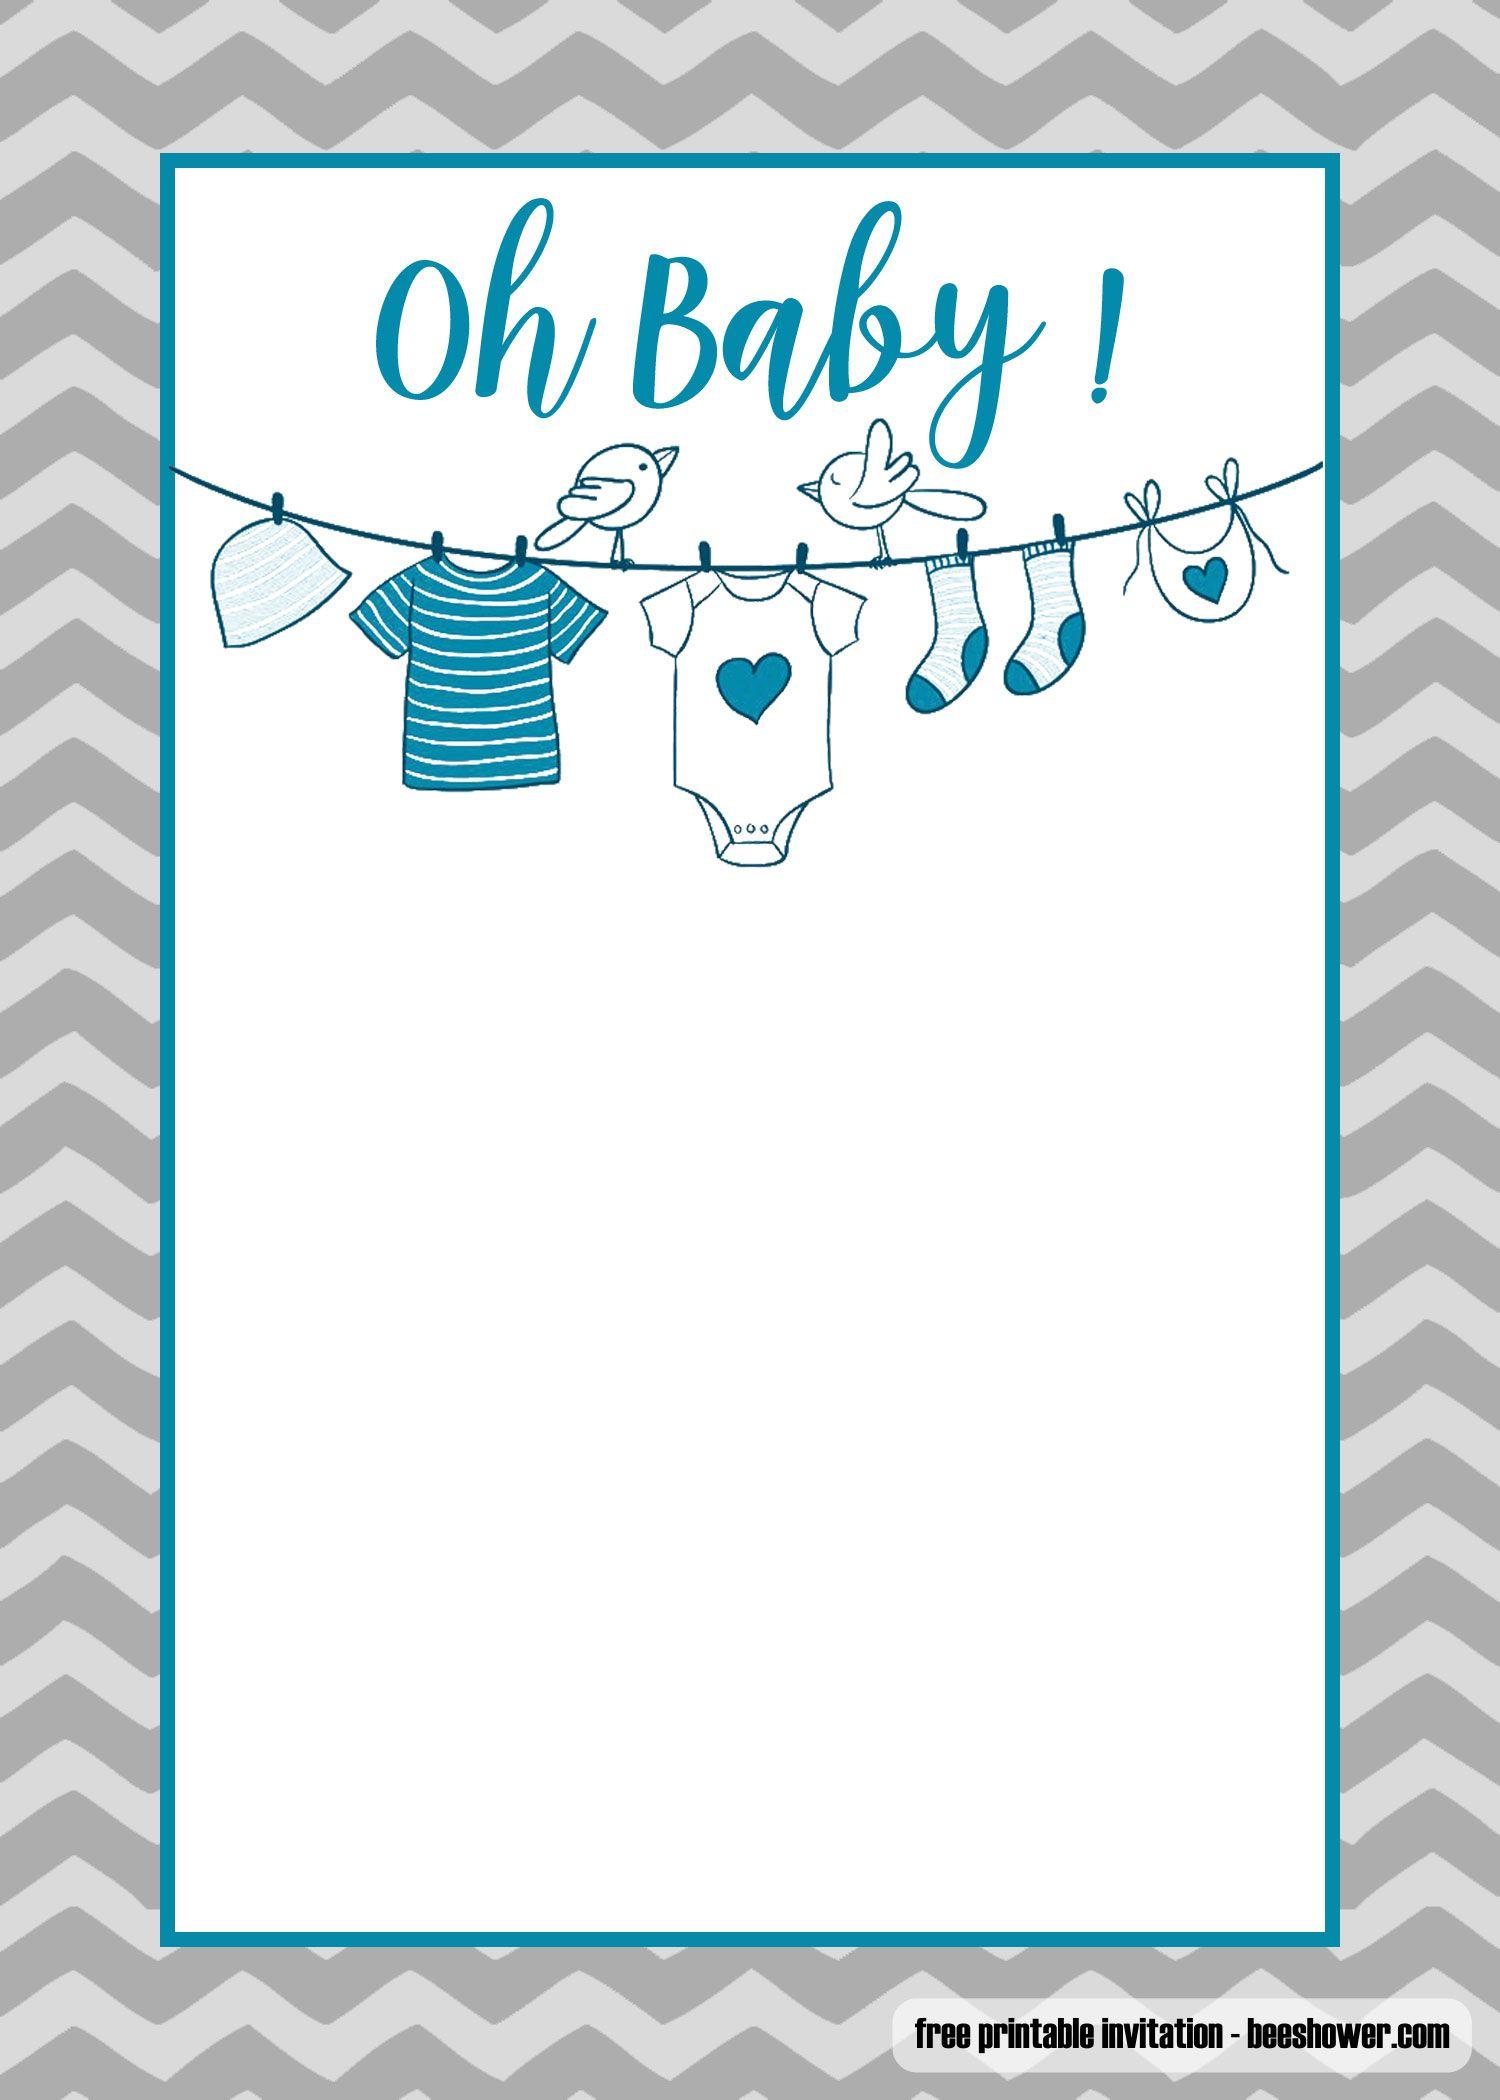 Free Printable Onesie Baby Shower Invitations Templates Printable Baby Shower Invitations Onesie Baby Shower Invitations Free Baby Shower Invitations